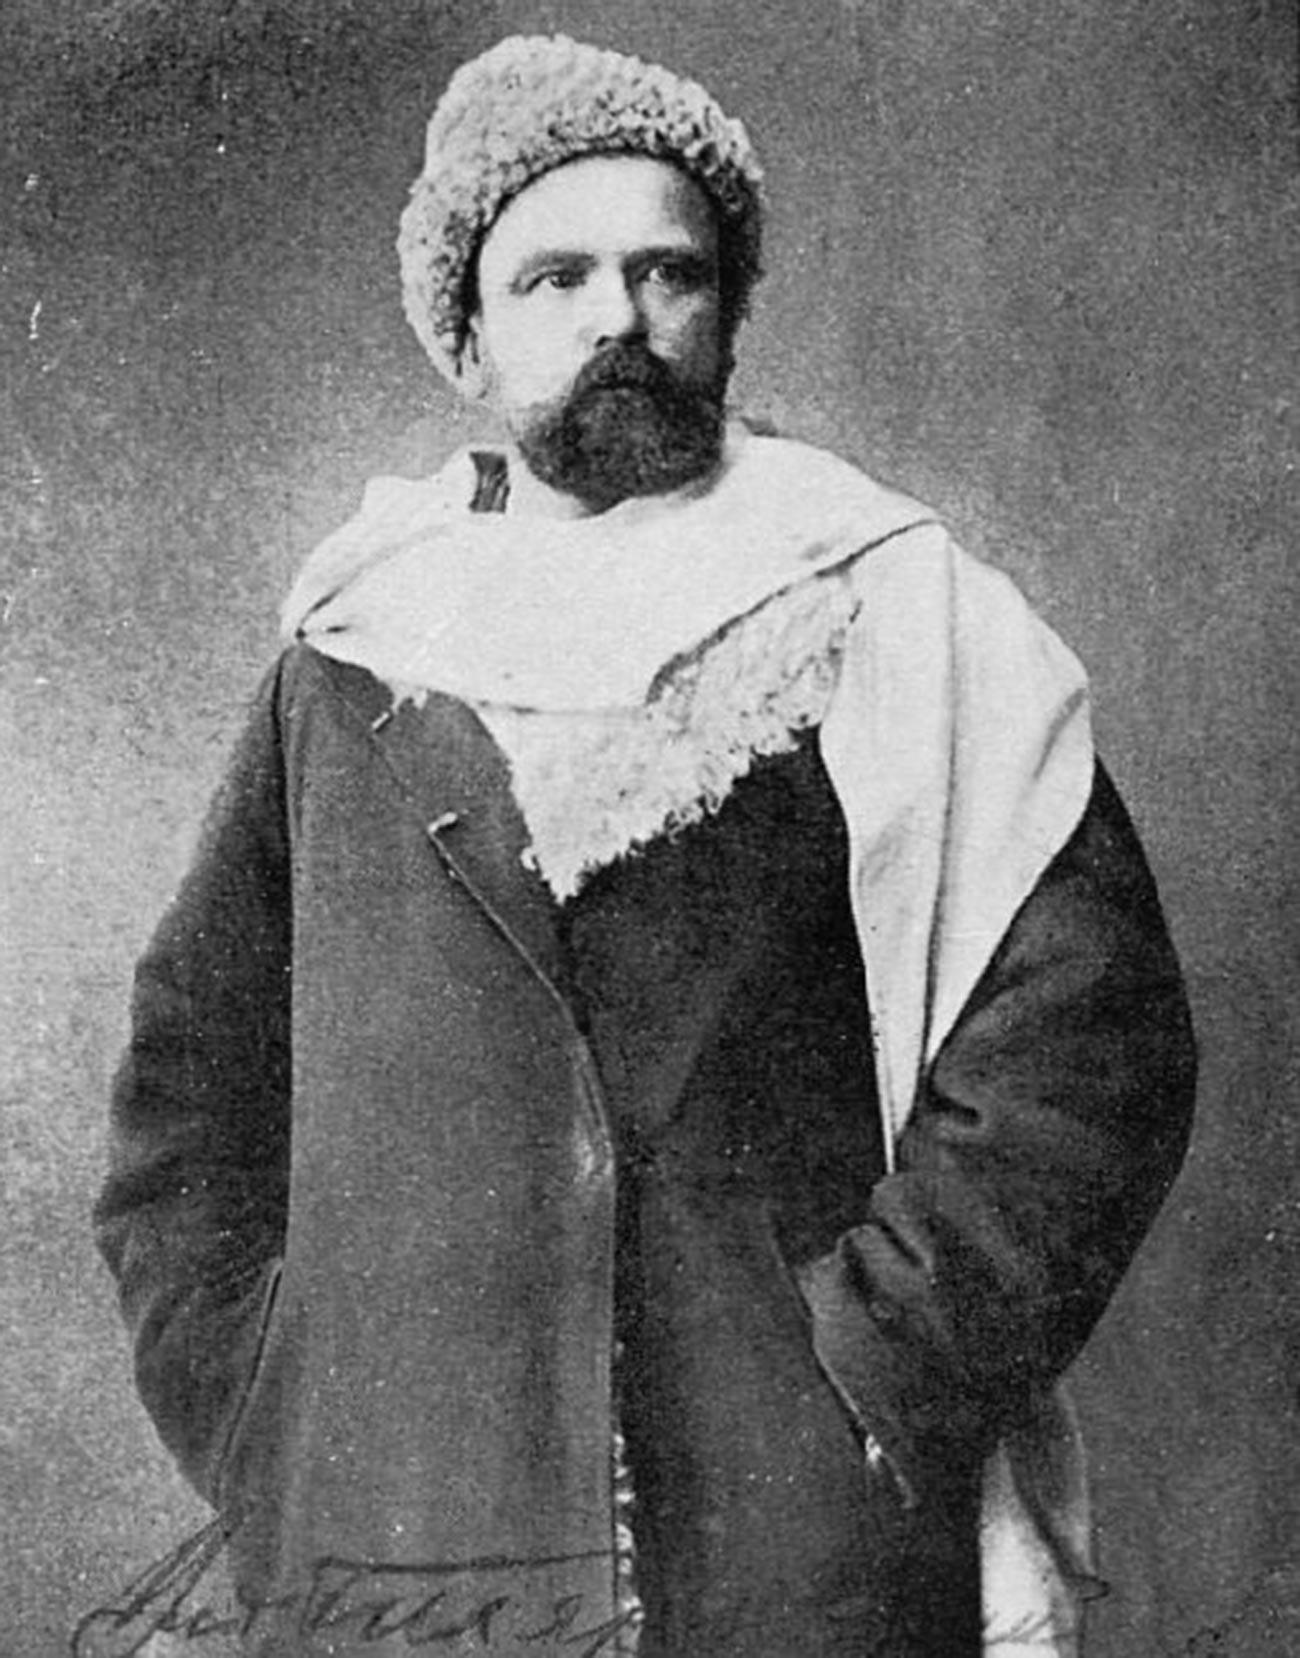 Moscow reporter Vladimir Gilyarovskiy.